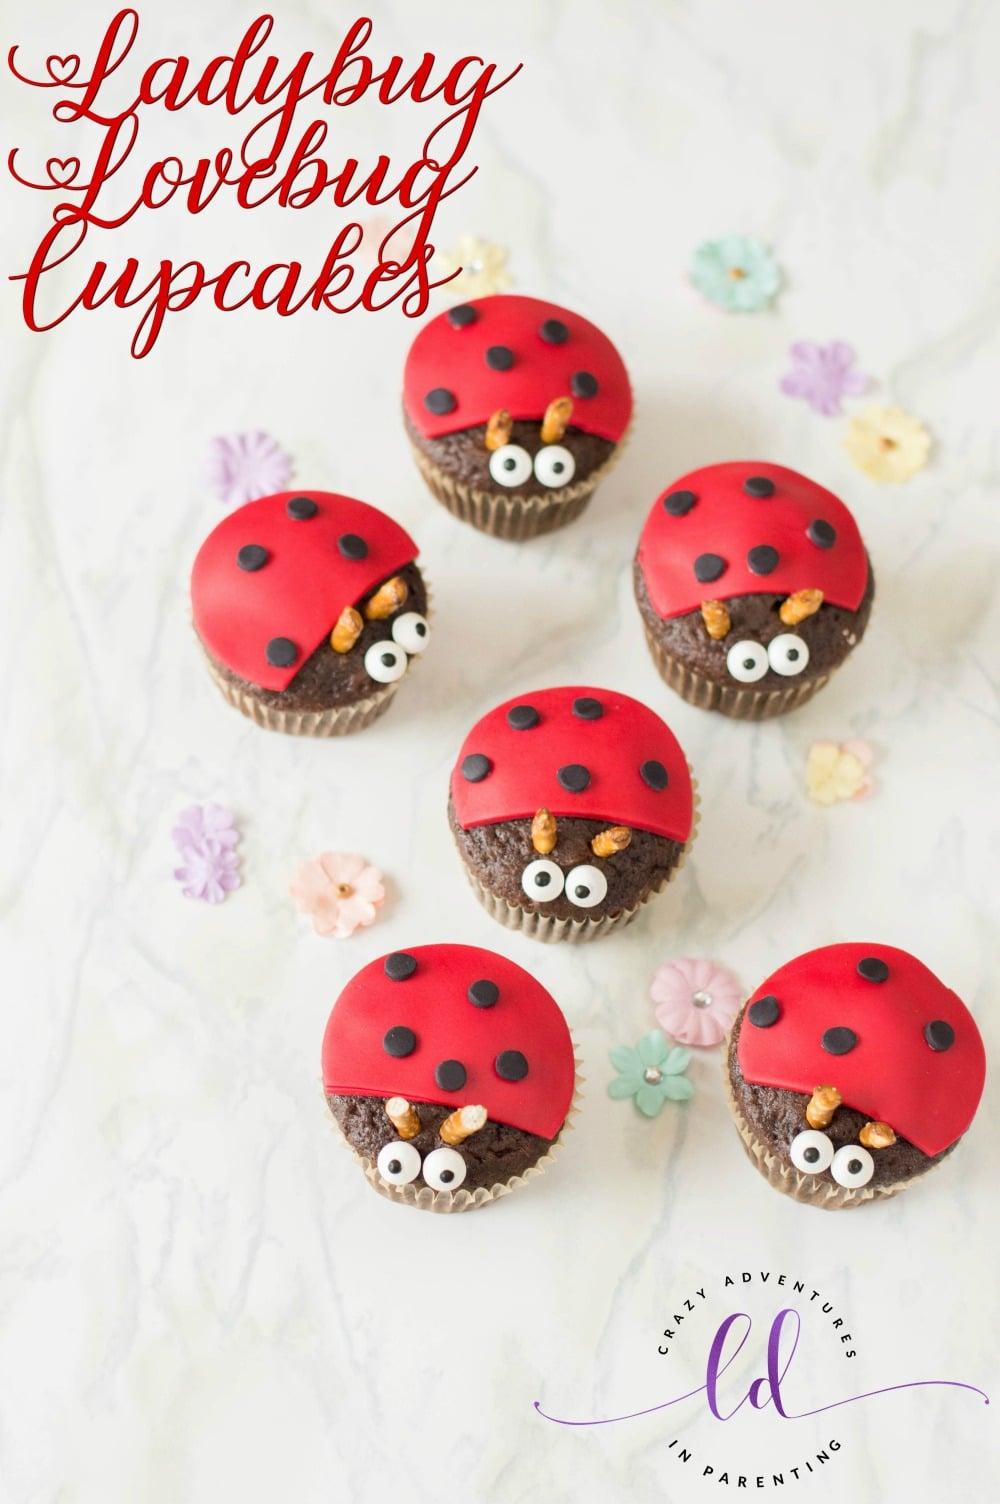 Ladybug Lovebug Cupcakes Recipe